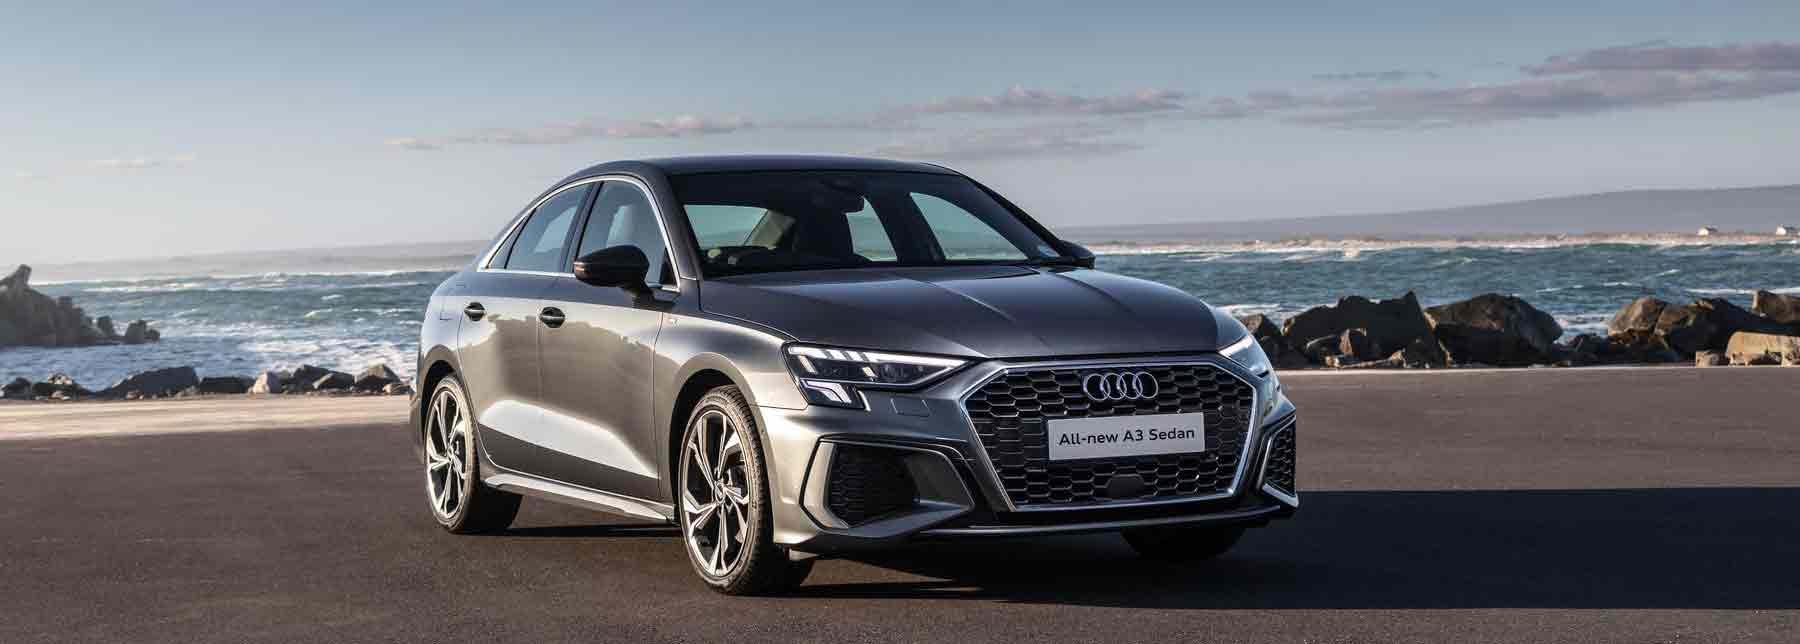 Audi A3 Sportback and sedan on-sale date announced